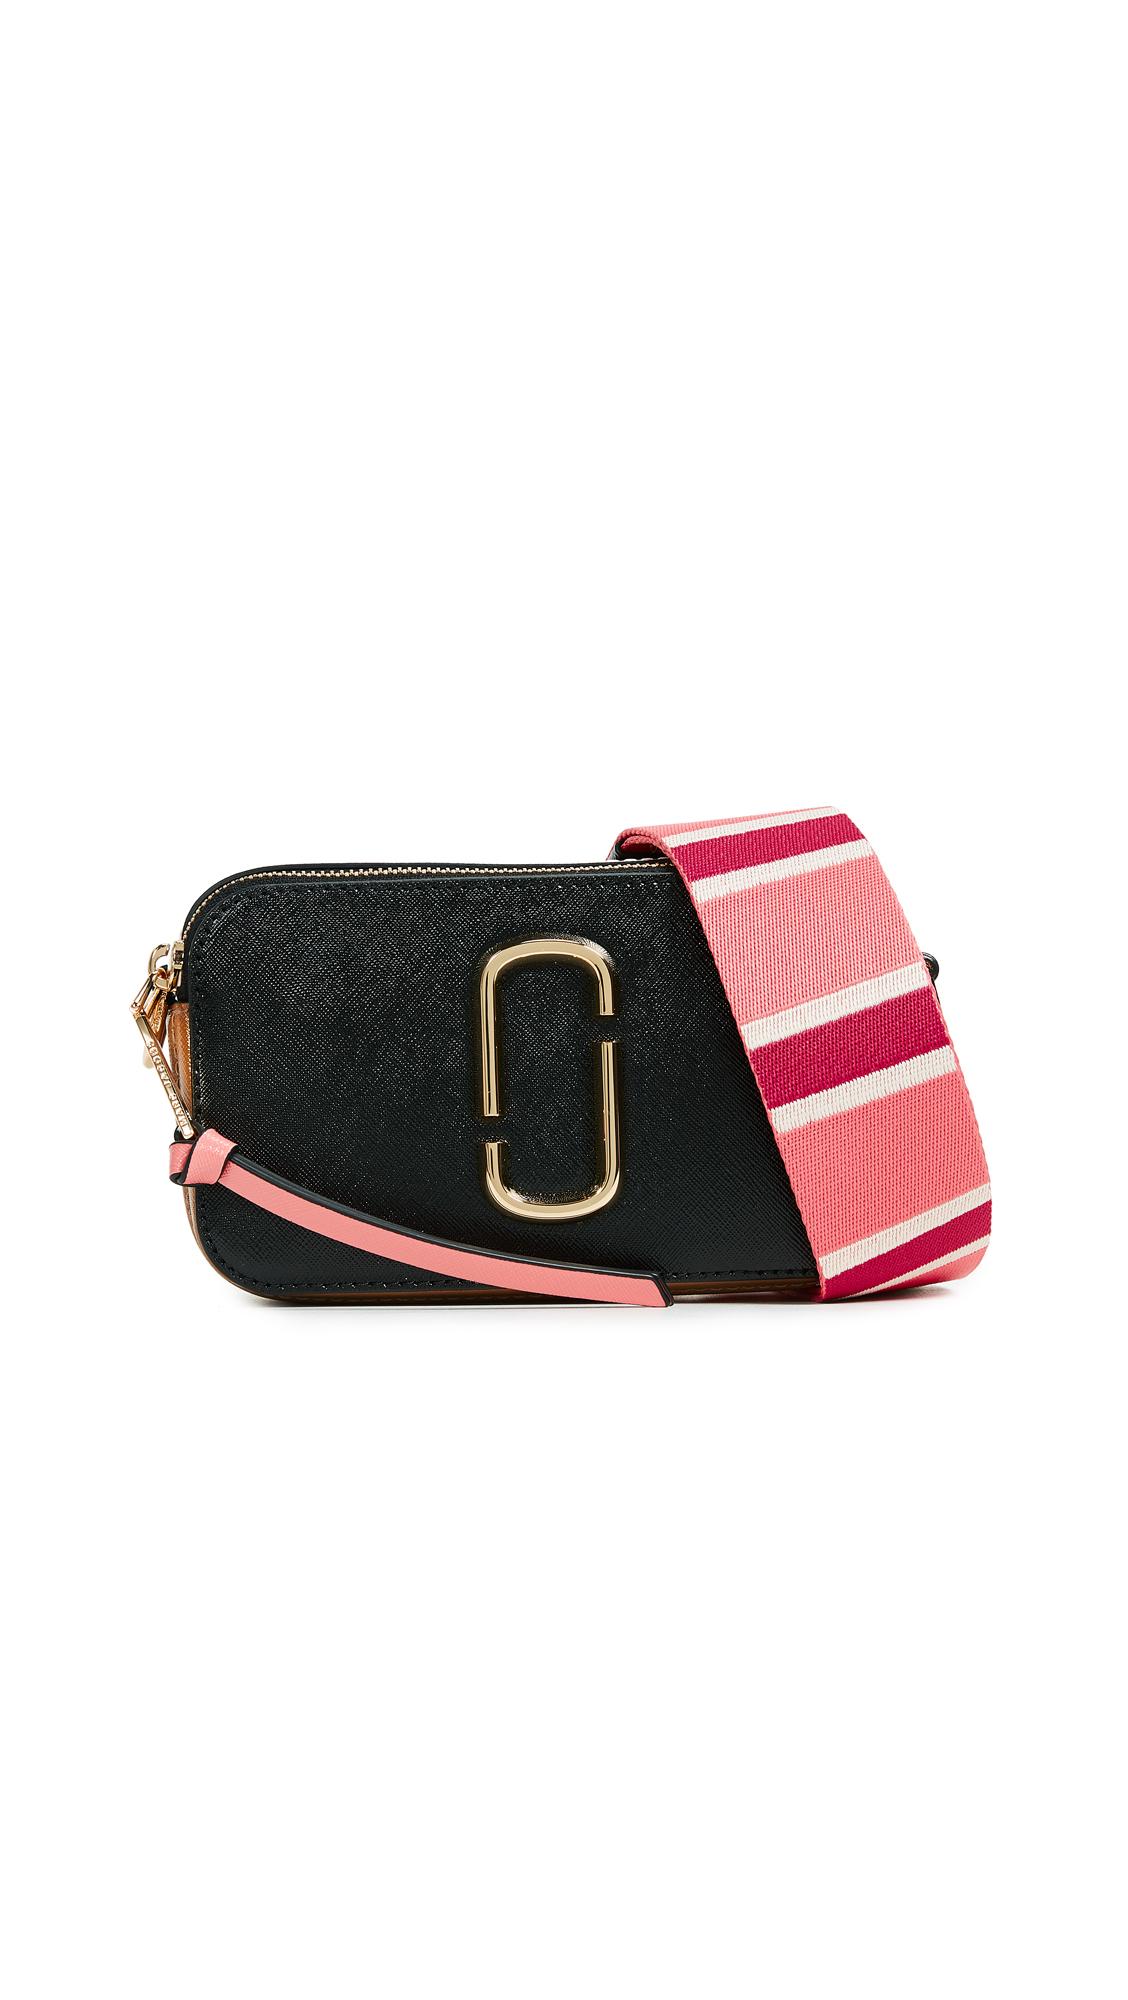 Marc Jacobs Snapshot Camera Bag - Black/Gazelle